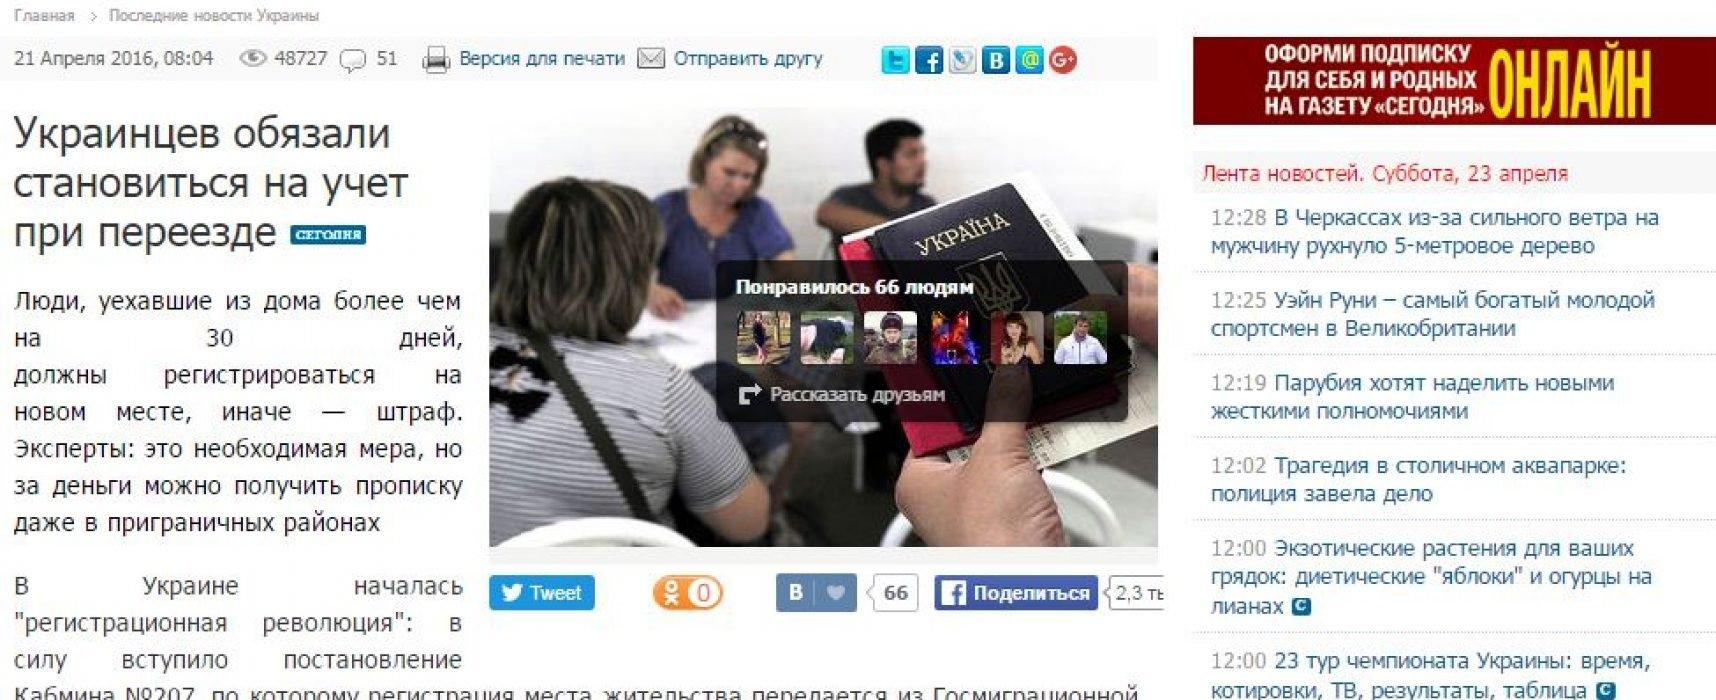 Fake: Boete voor Oekraïners die elders wonen dan in een officieel geregistreerde woonplaats